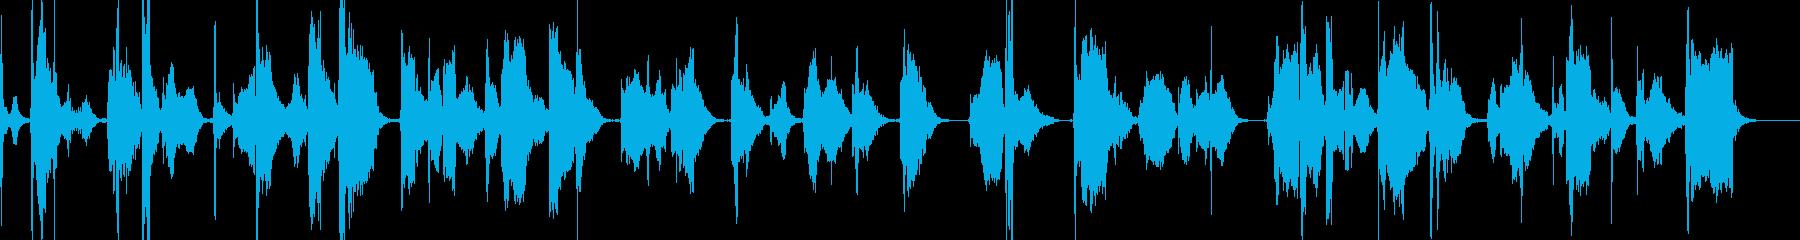 Wabizenの再生済みの波形